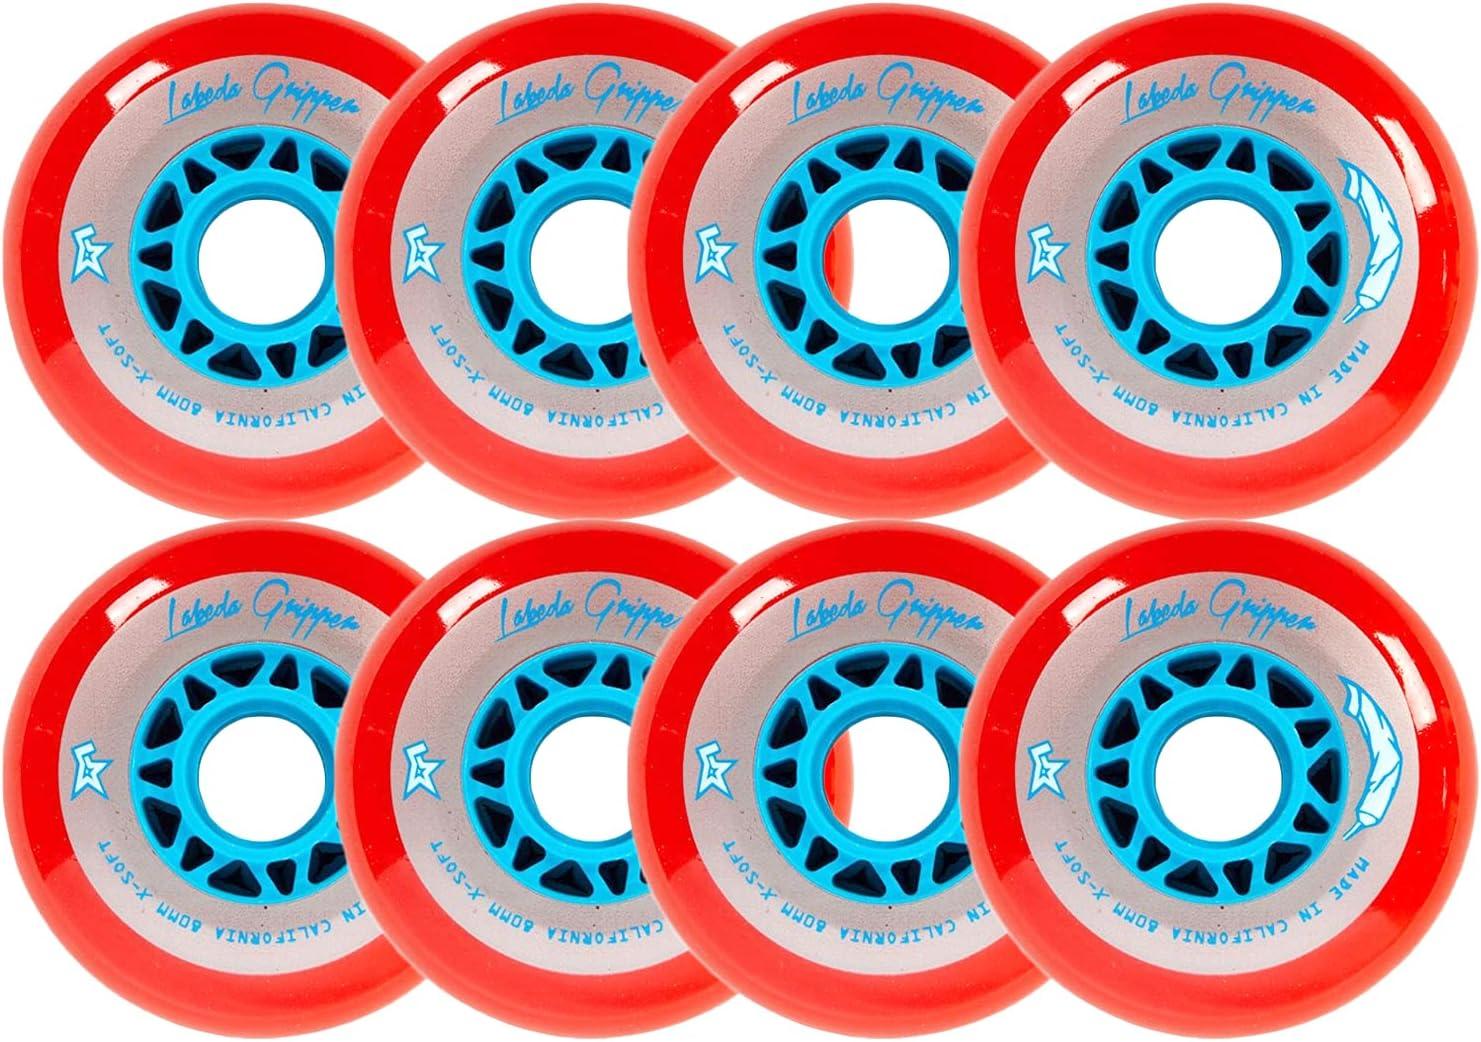 Labeda Wheels 80mm //76mm Hilo Gripper Red X-Soft Inline Indoor Roller Hockey 76A